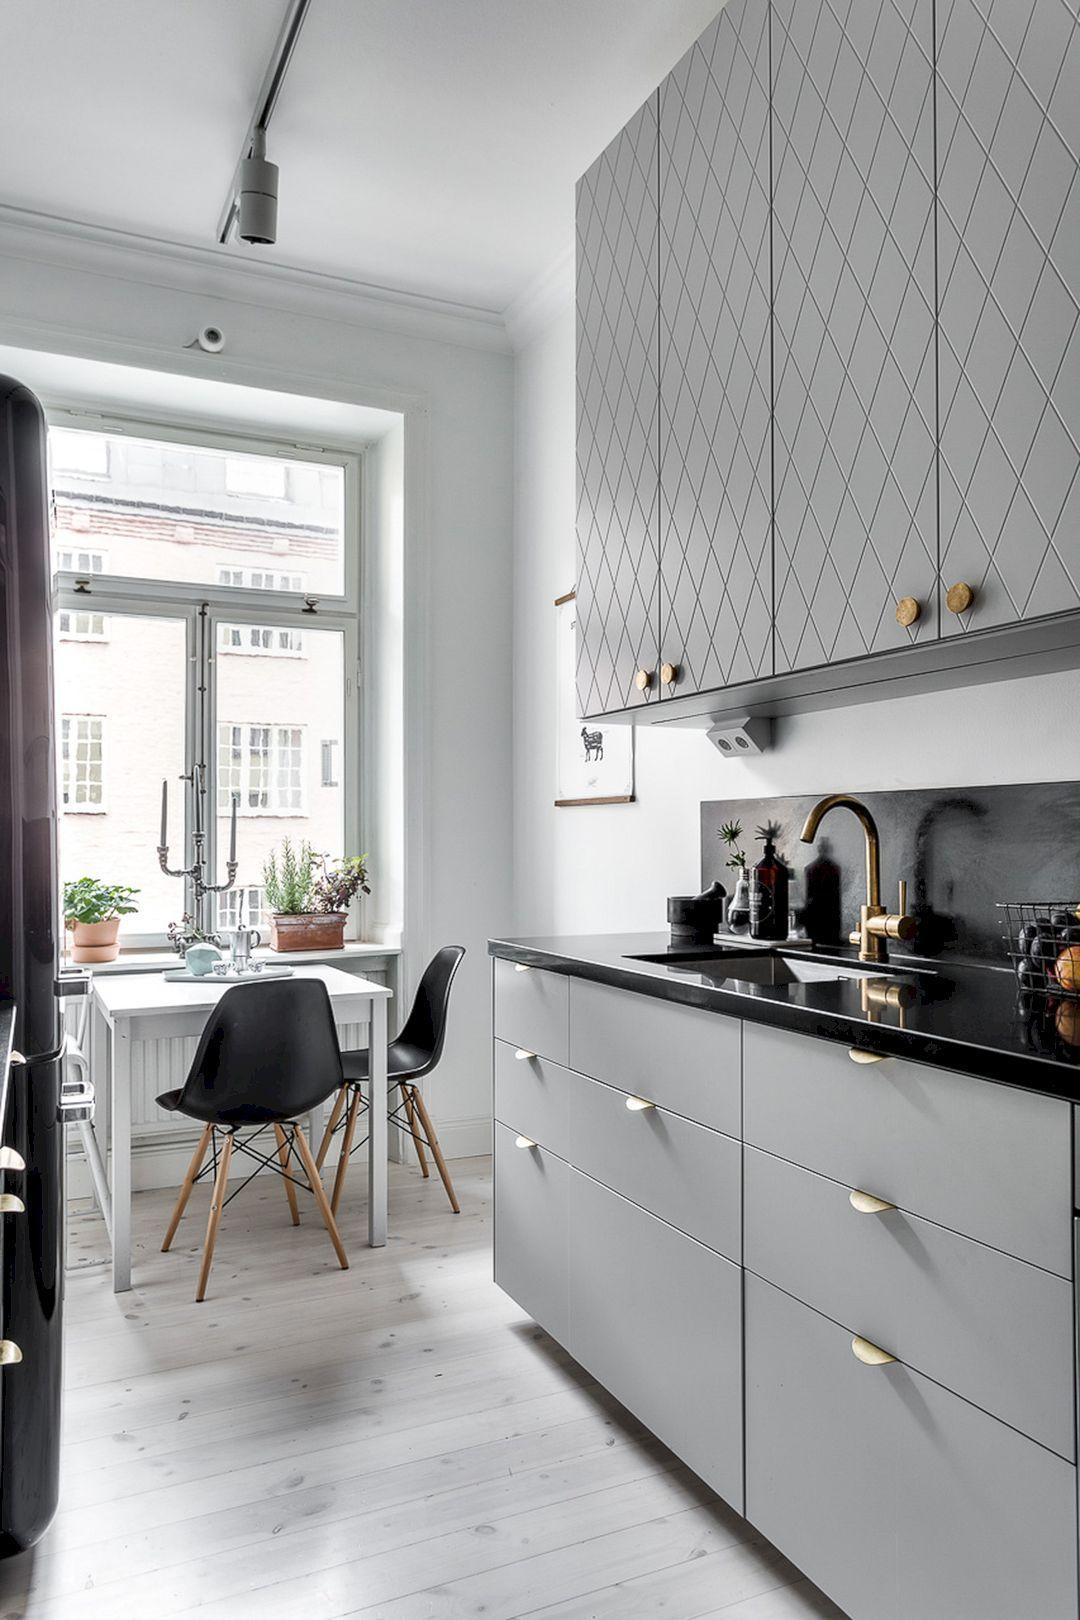 91 Brilliant Small Kitchen Remodel Ideas https://www ...